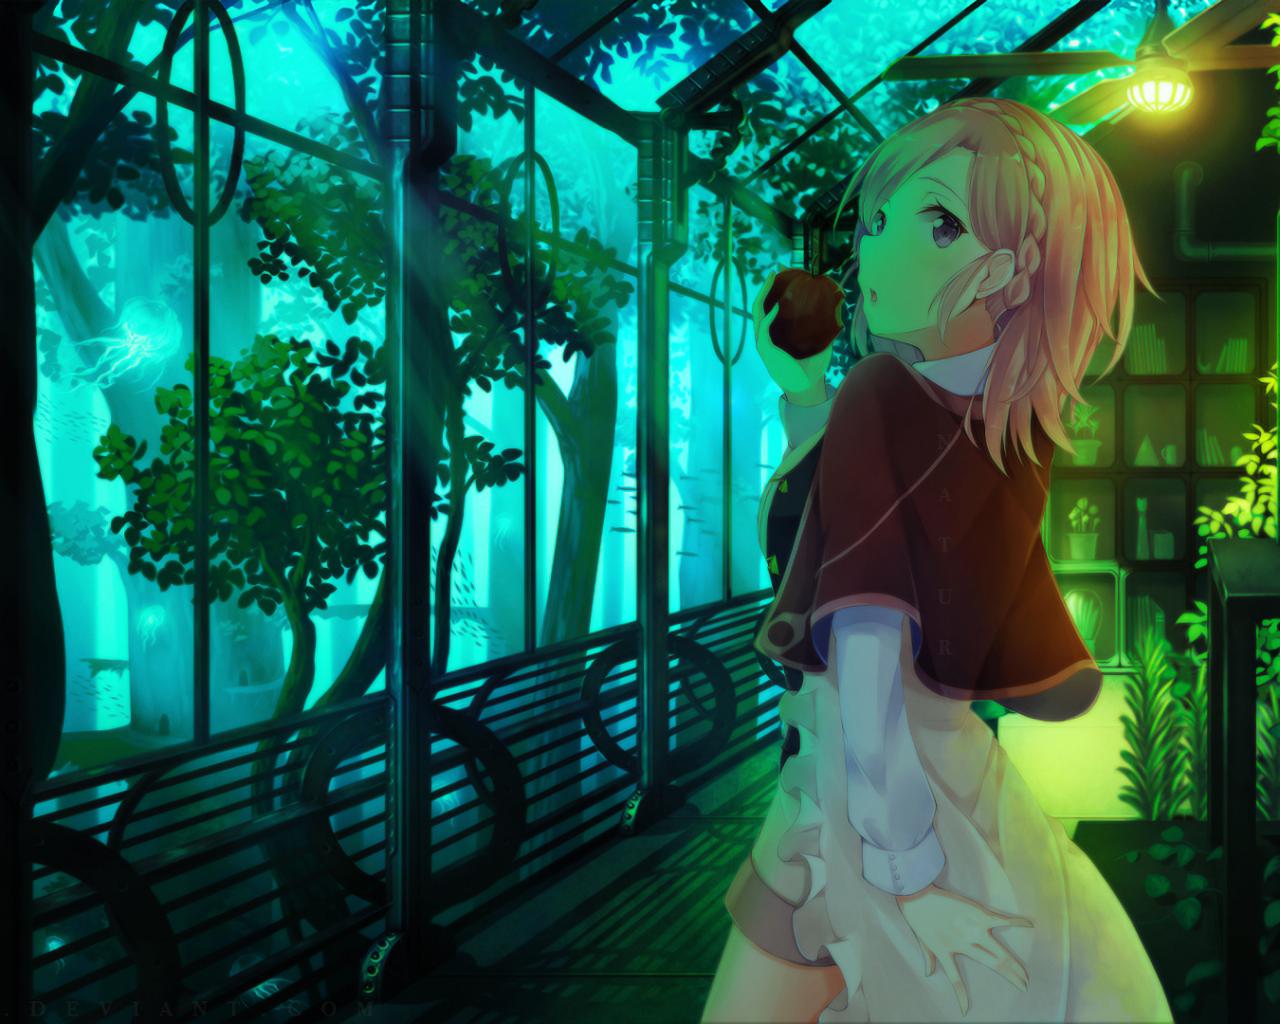 Anime Girl, Garden, Apple, Pink Hair, Plants, Trees - Девушка В Оранжерее , HD Wallpaper & Backgrounds